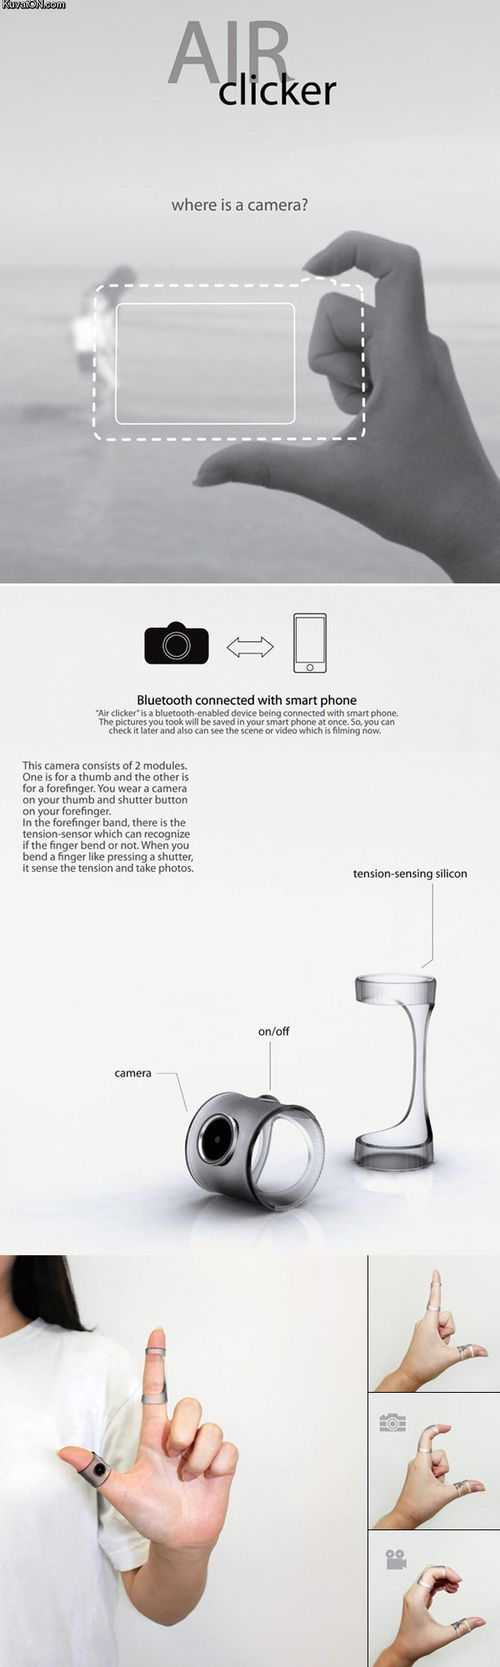 Air clicker - the new camera?